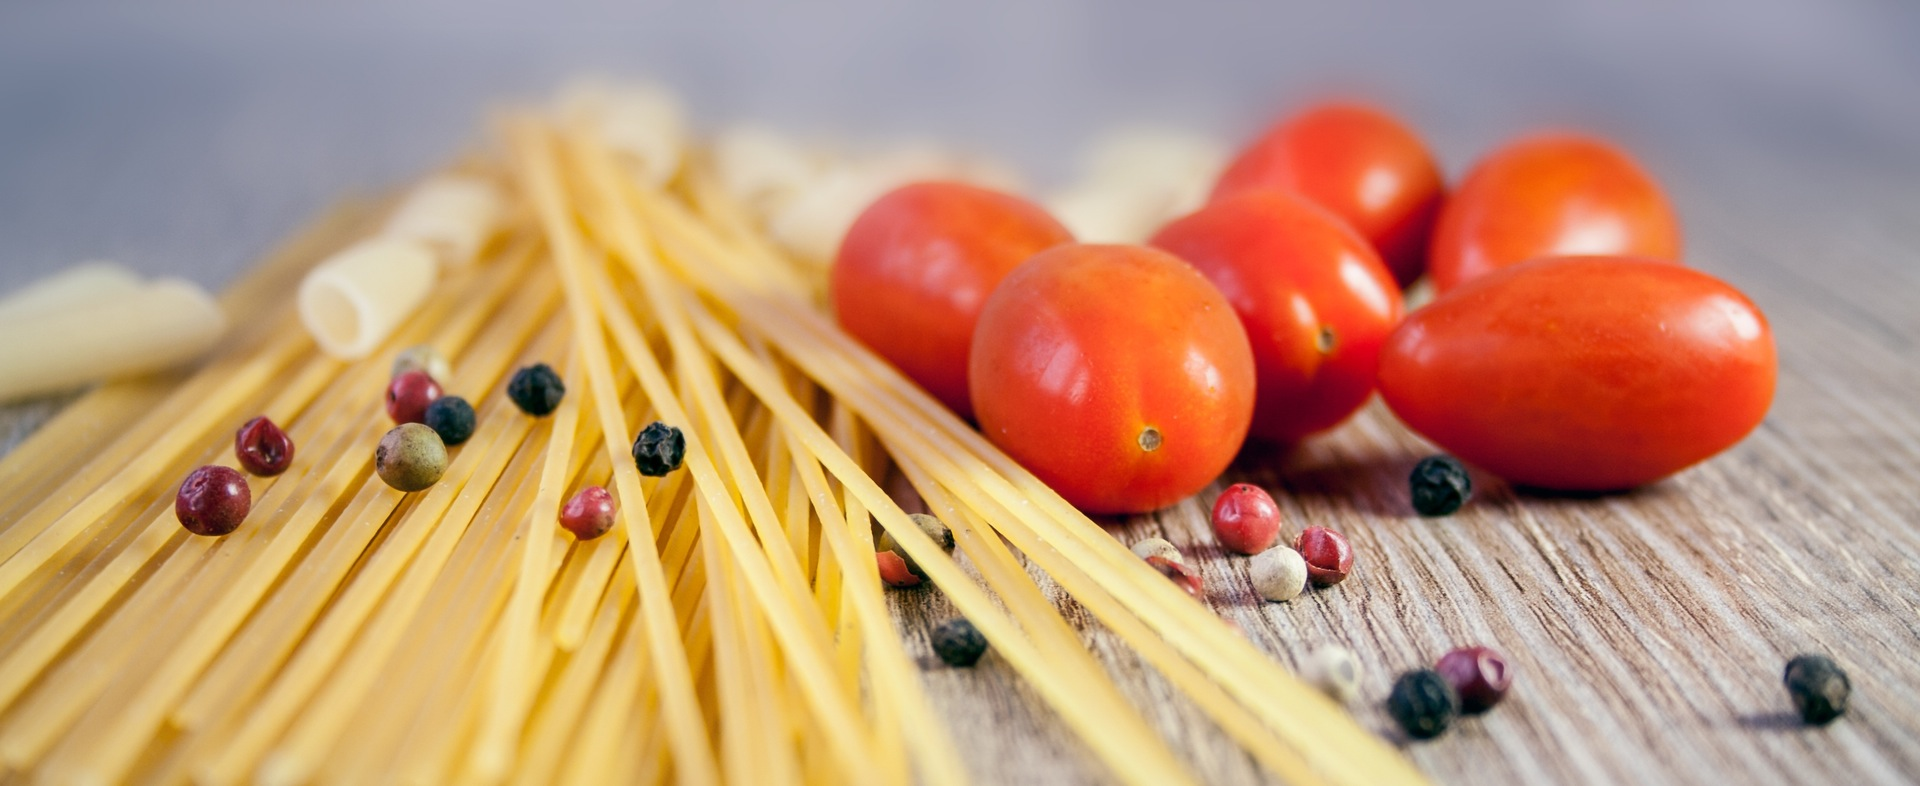 https://www.dotmug.net/wp-content/uploads/2016/05/pasta-noodles-cook-tomato-38233.jpeg